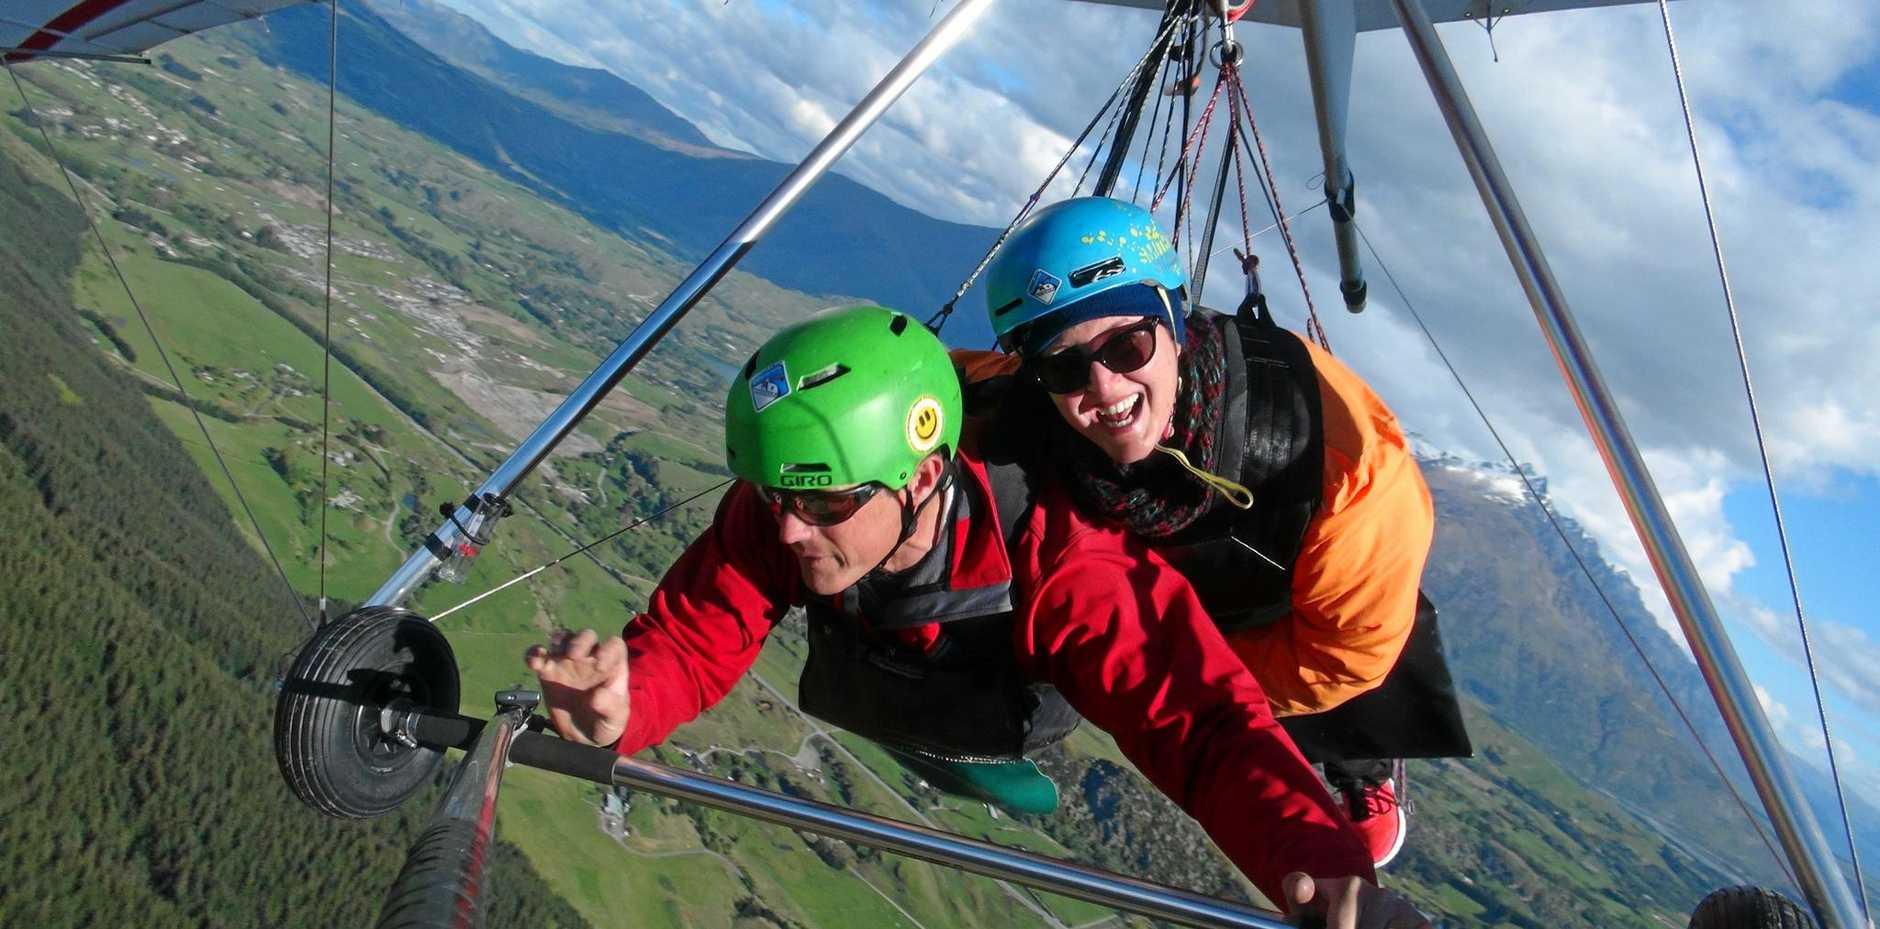 Hang gliding over Queenstown's spectacular alpine scenery.